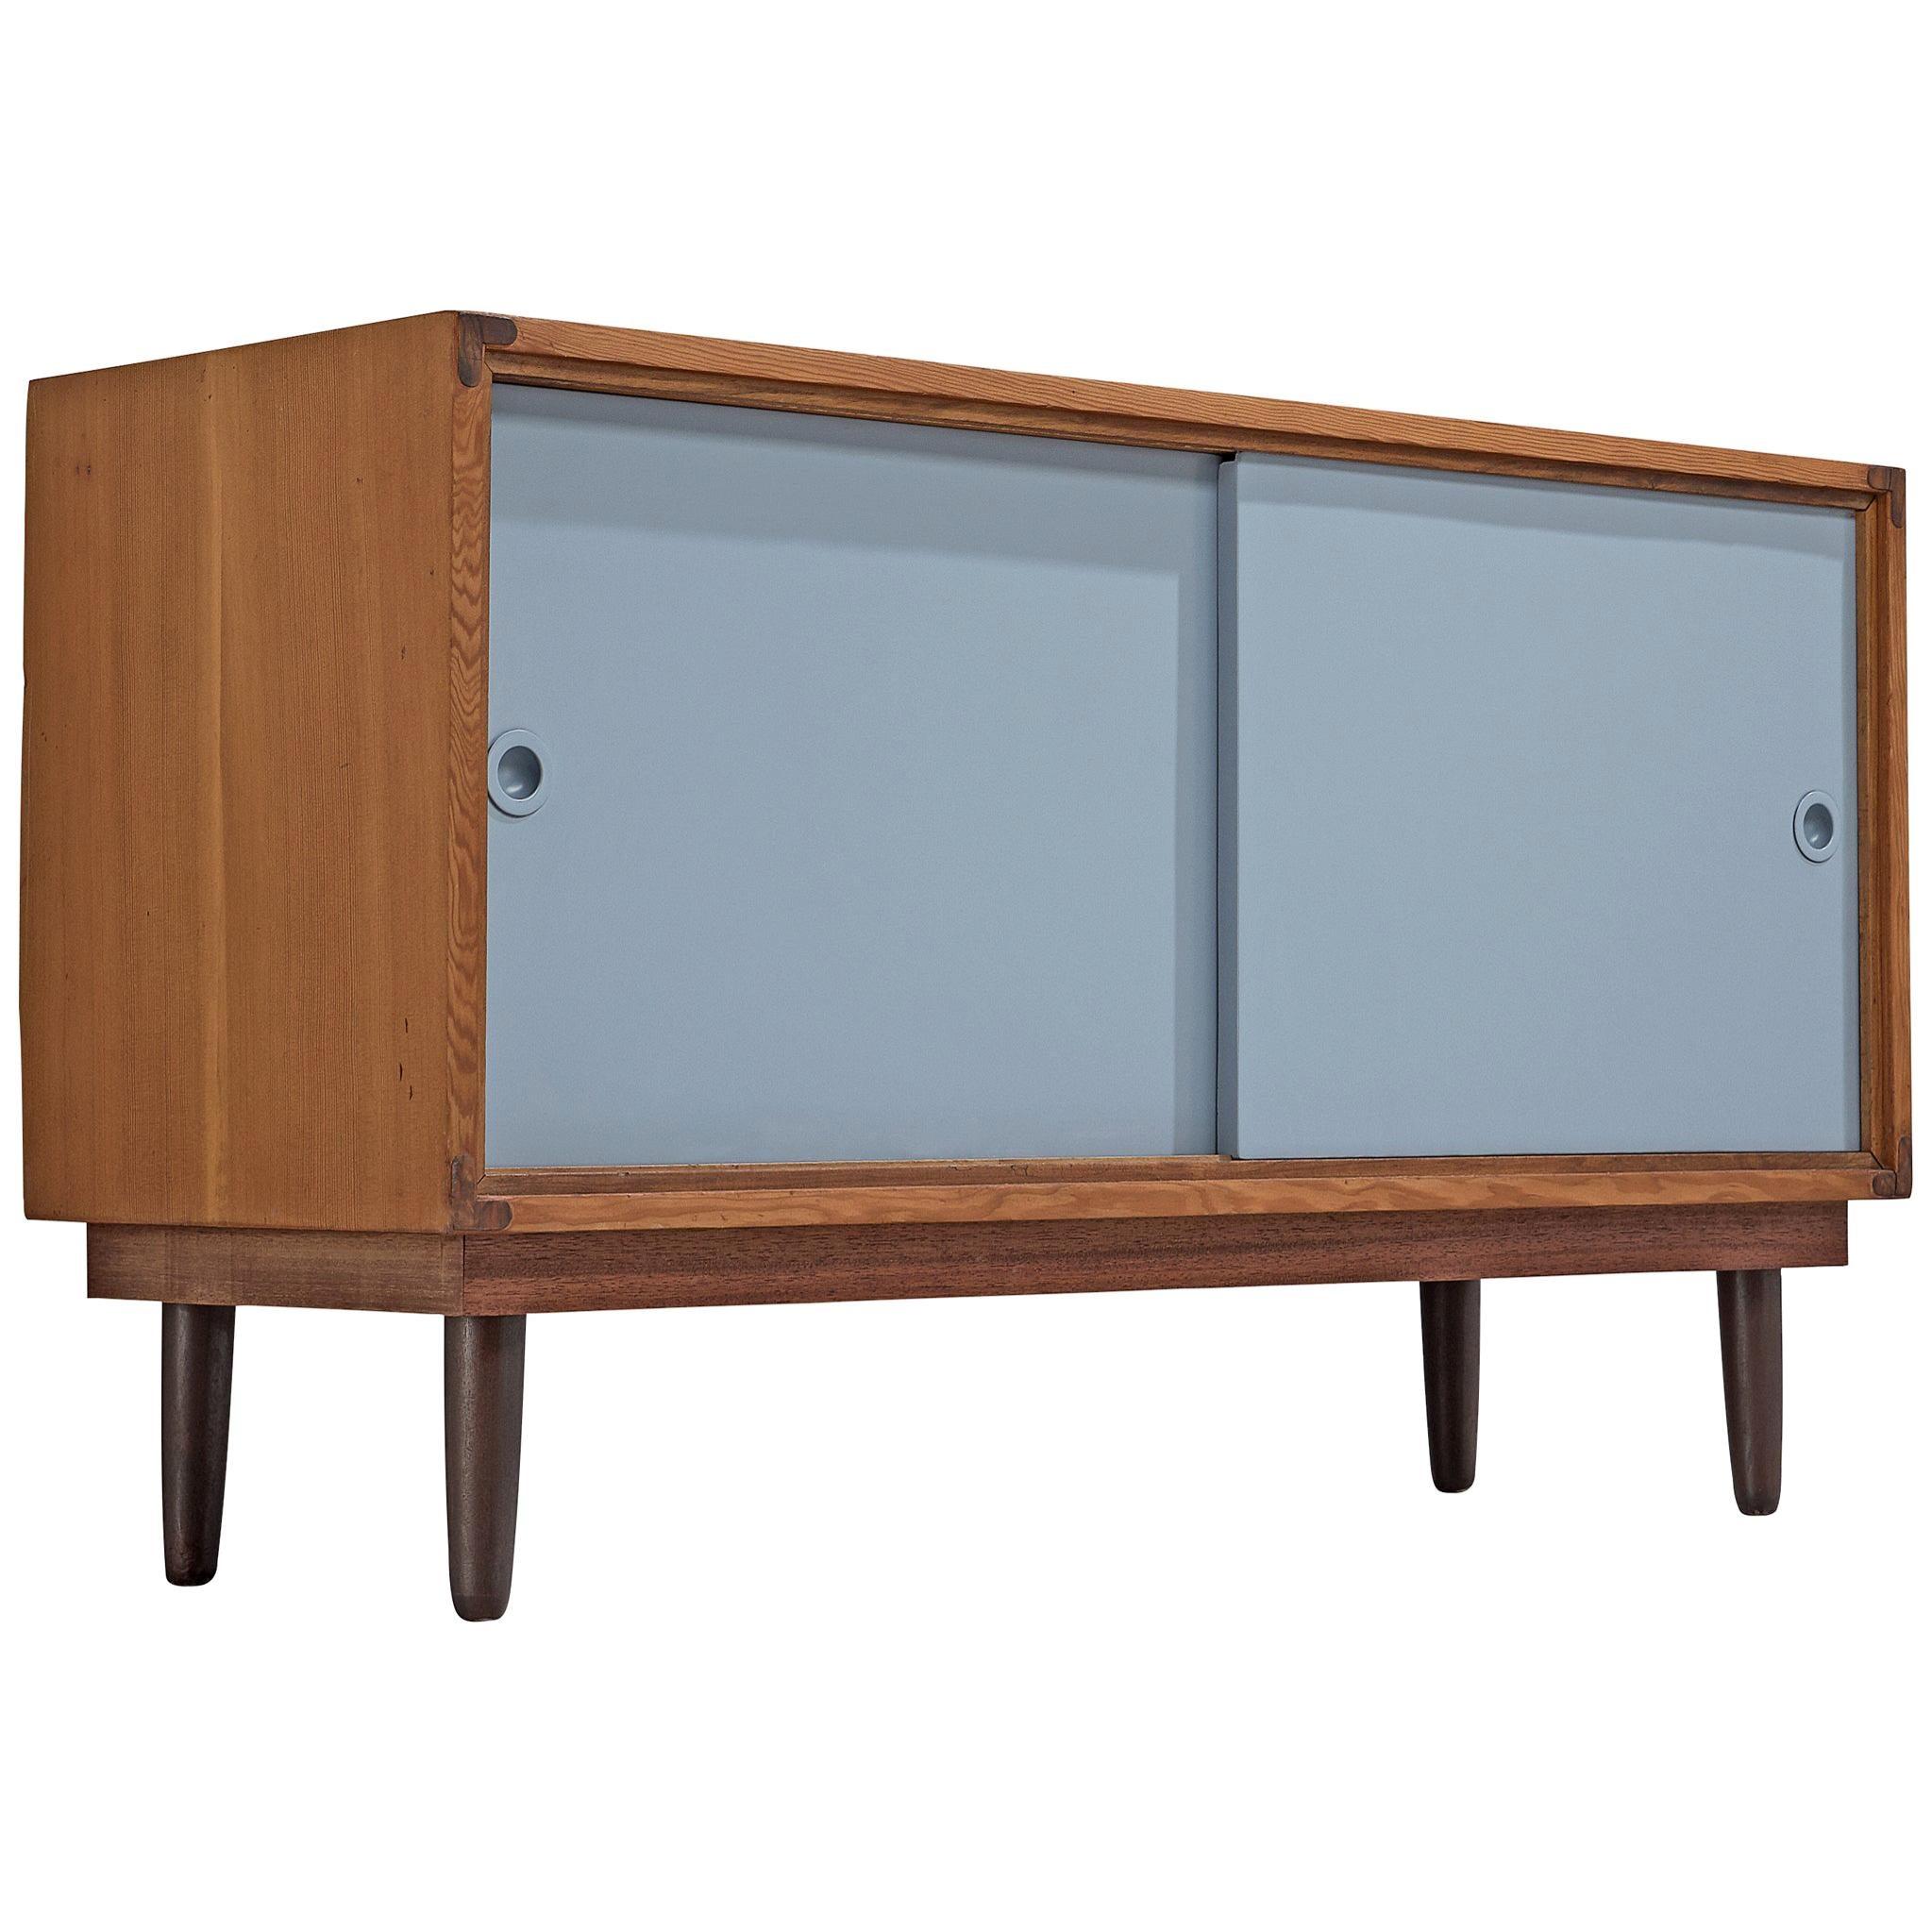 Danish Solid Pine Cabinet with Blue Sliding Doors, Denmark, 1950s